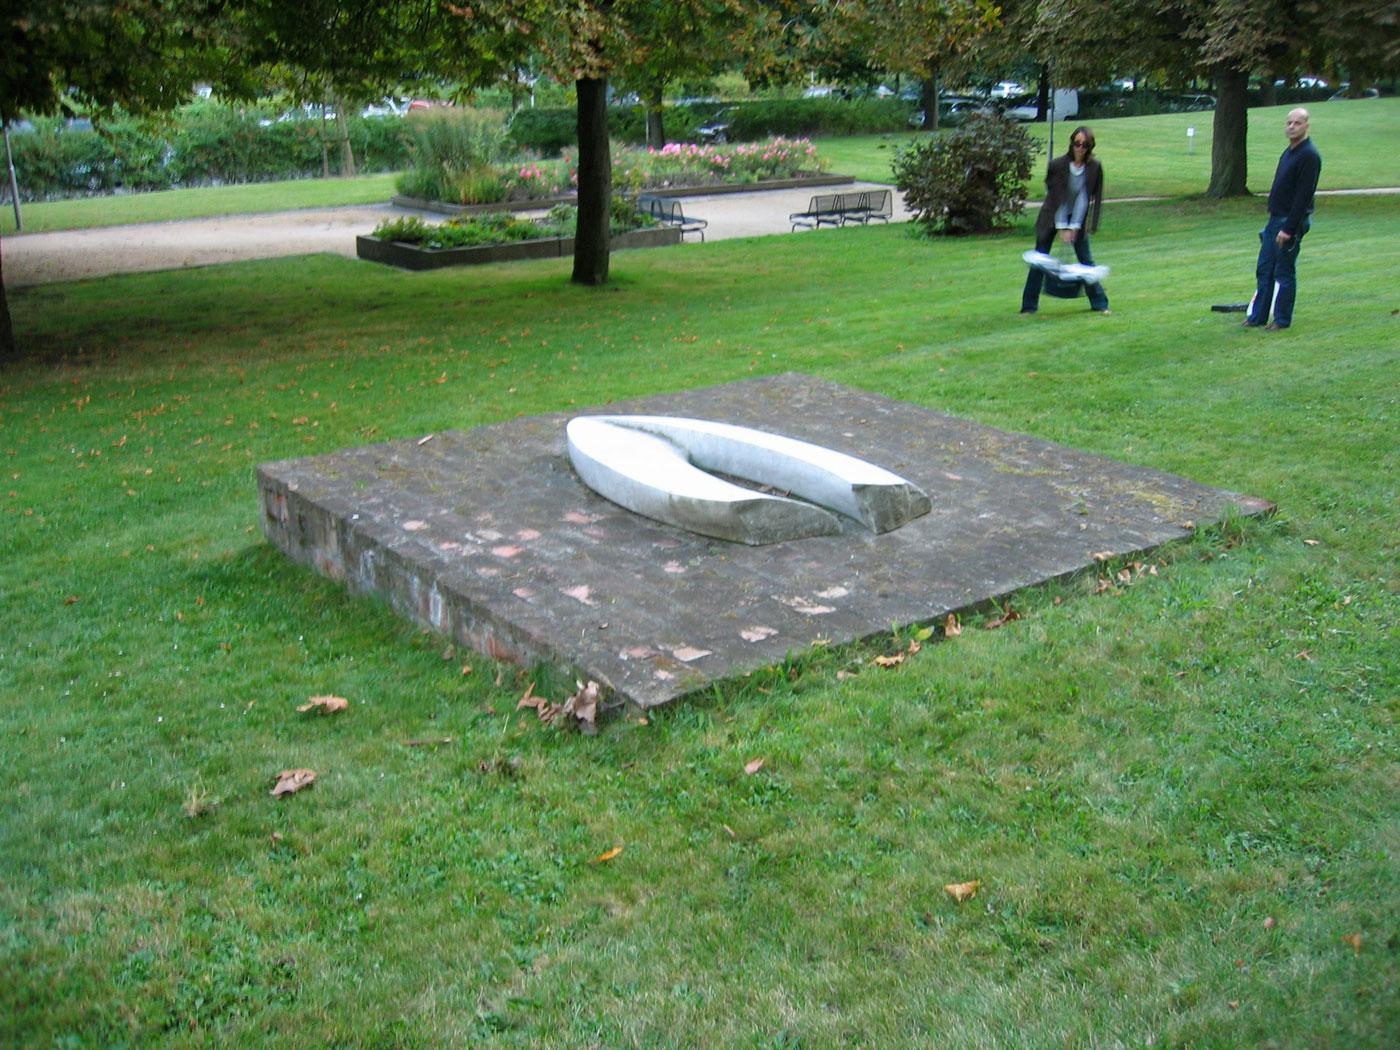 MARVEL / BRICKS,  © 1991-95, marvel sculpture and bricks base, 250 x 250 x 80 cm,  sculpture in front of the Benjamin Franklin Hospital, Berlin